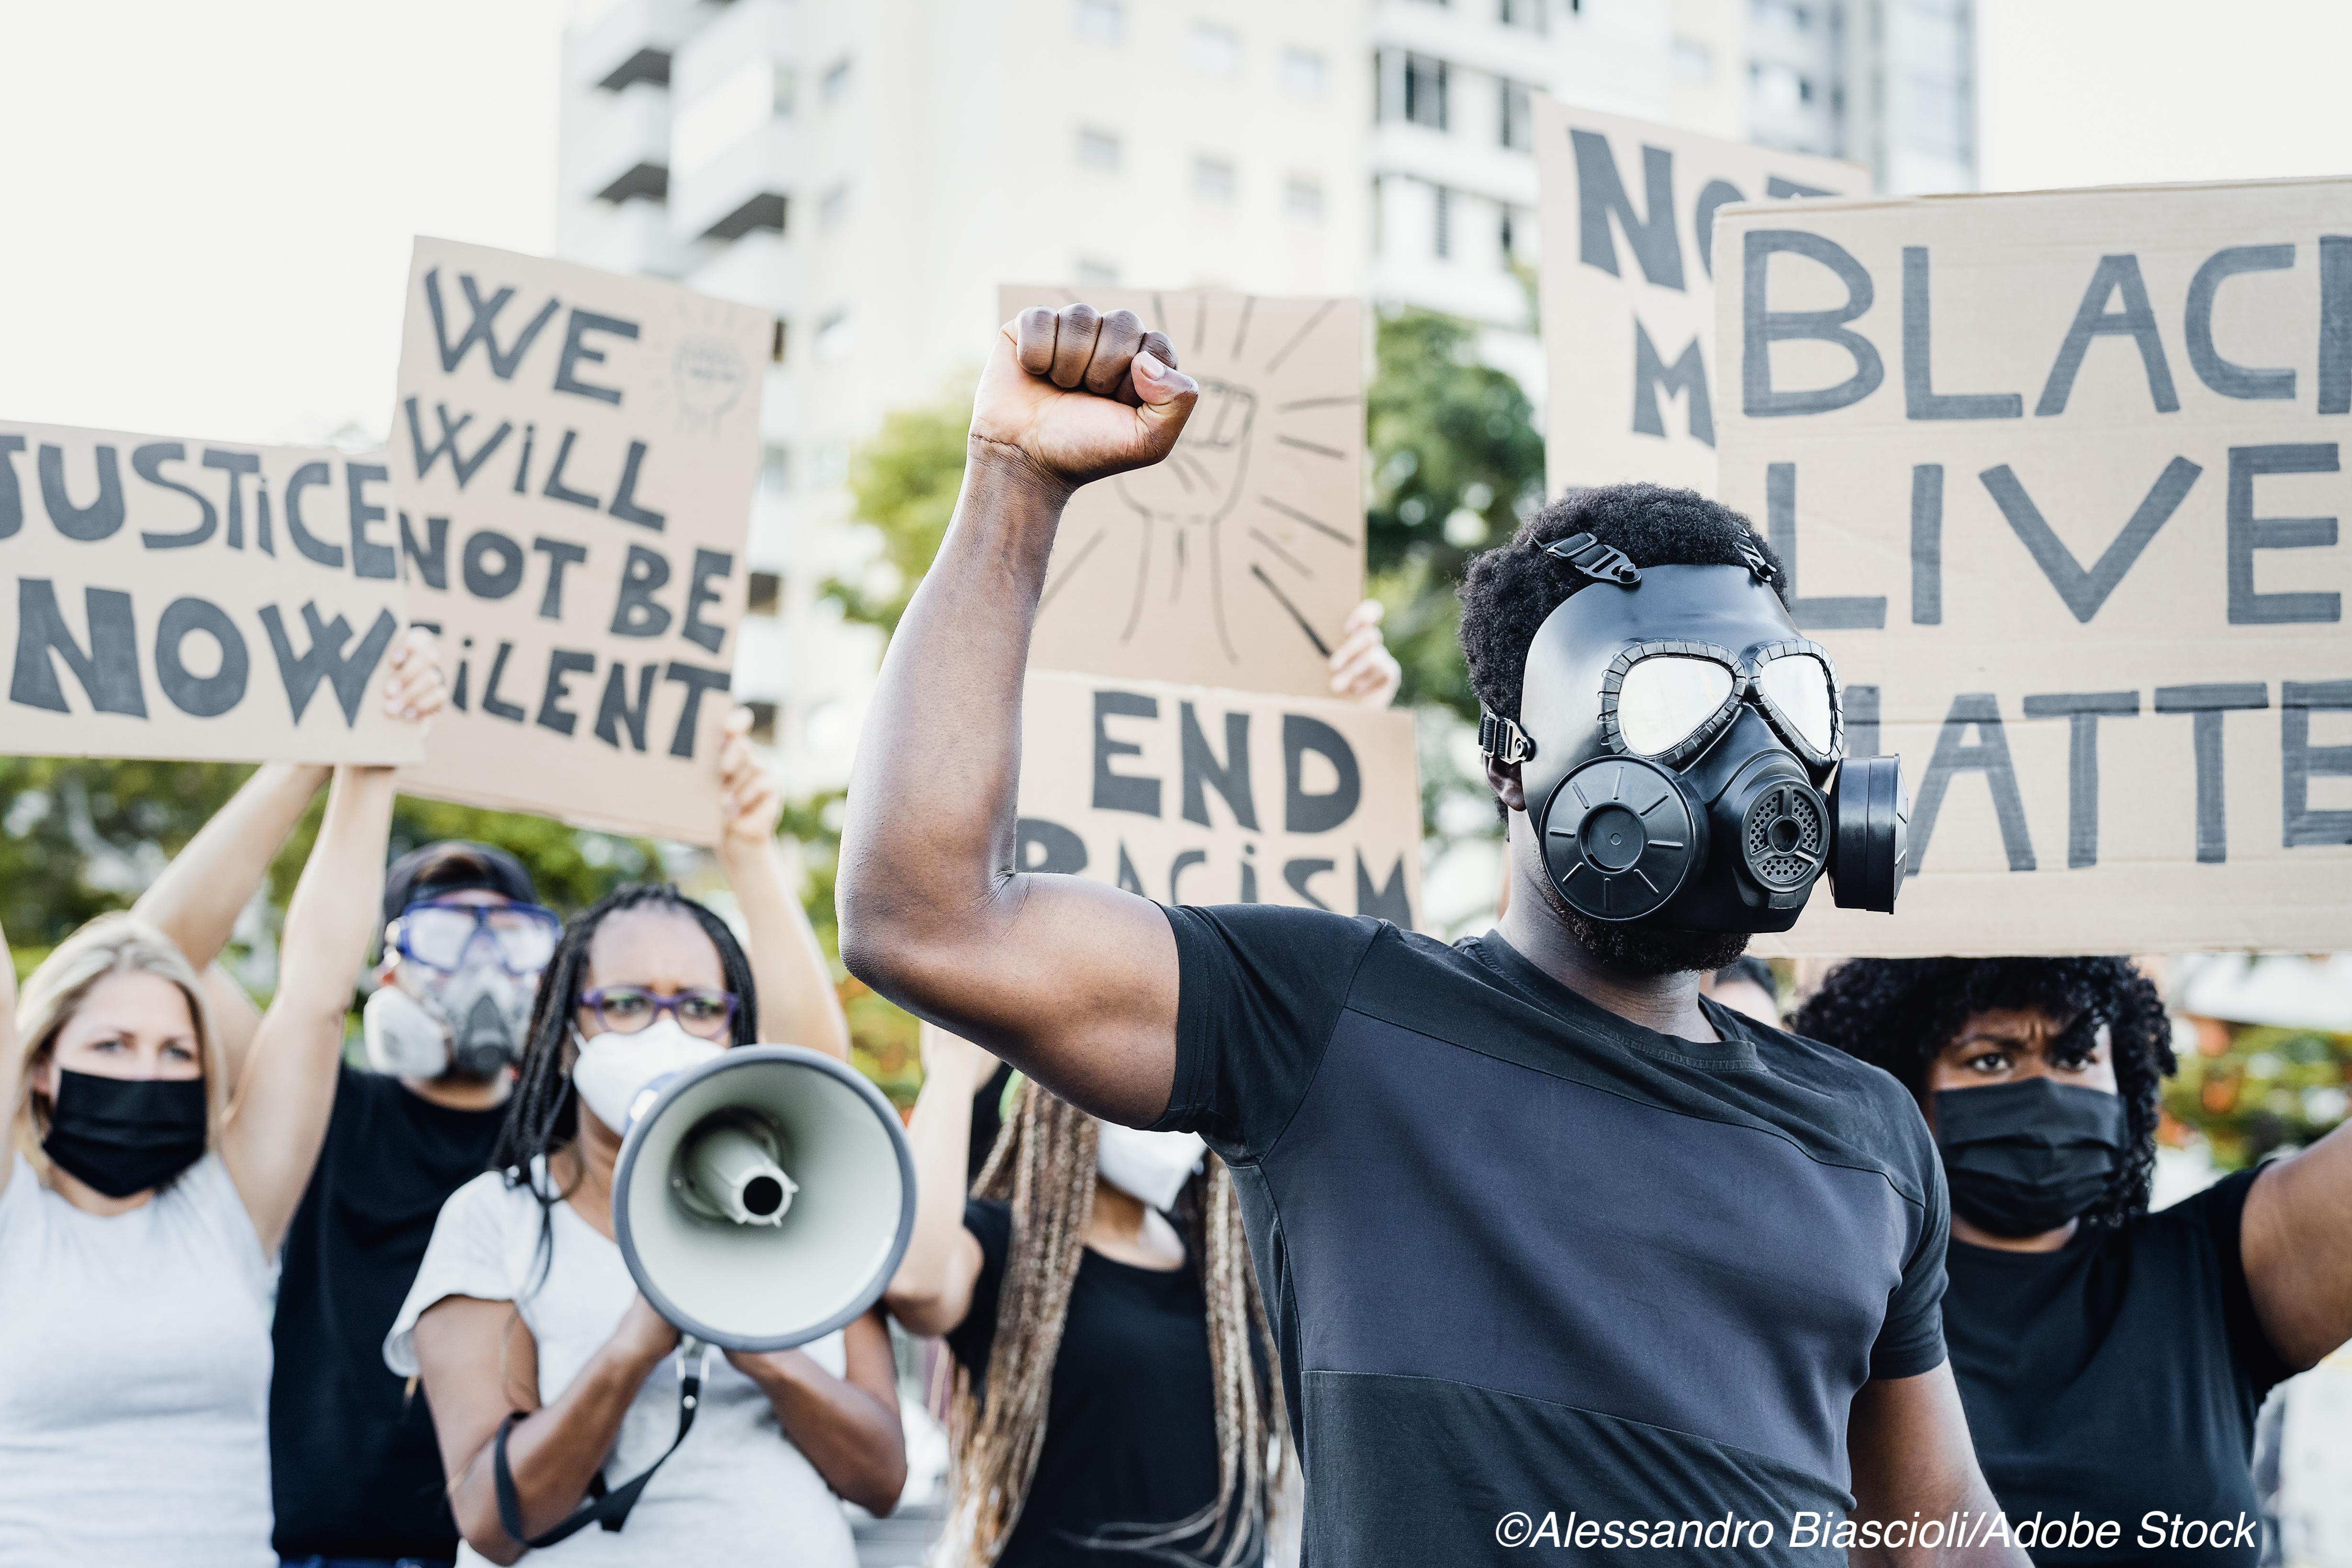 AMA: Racism is a Threat to U.S. Public Health